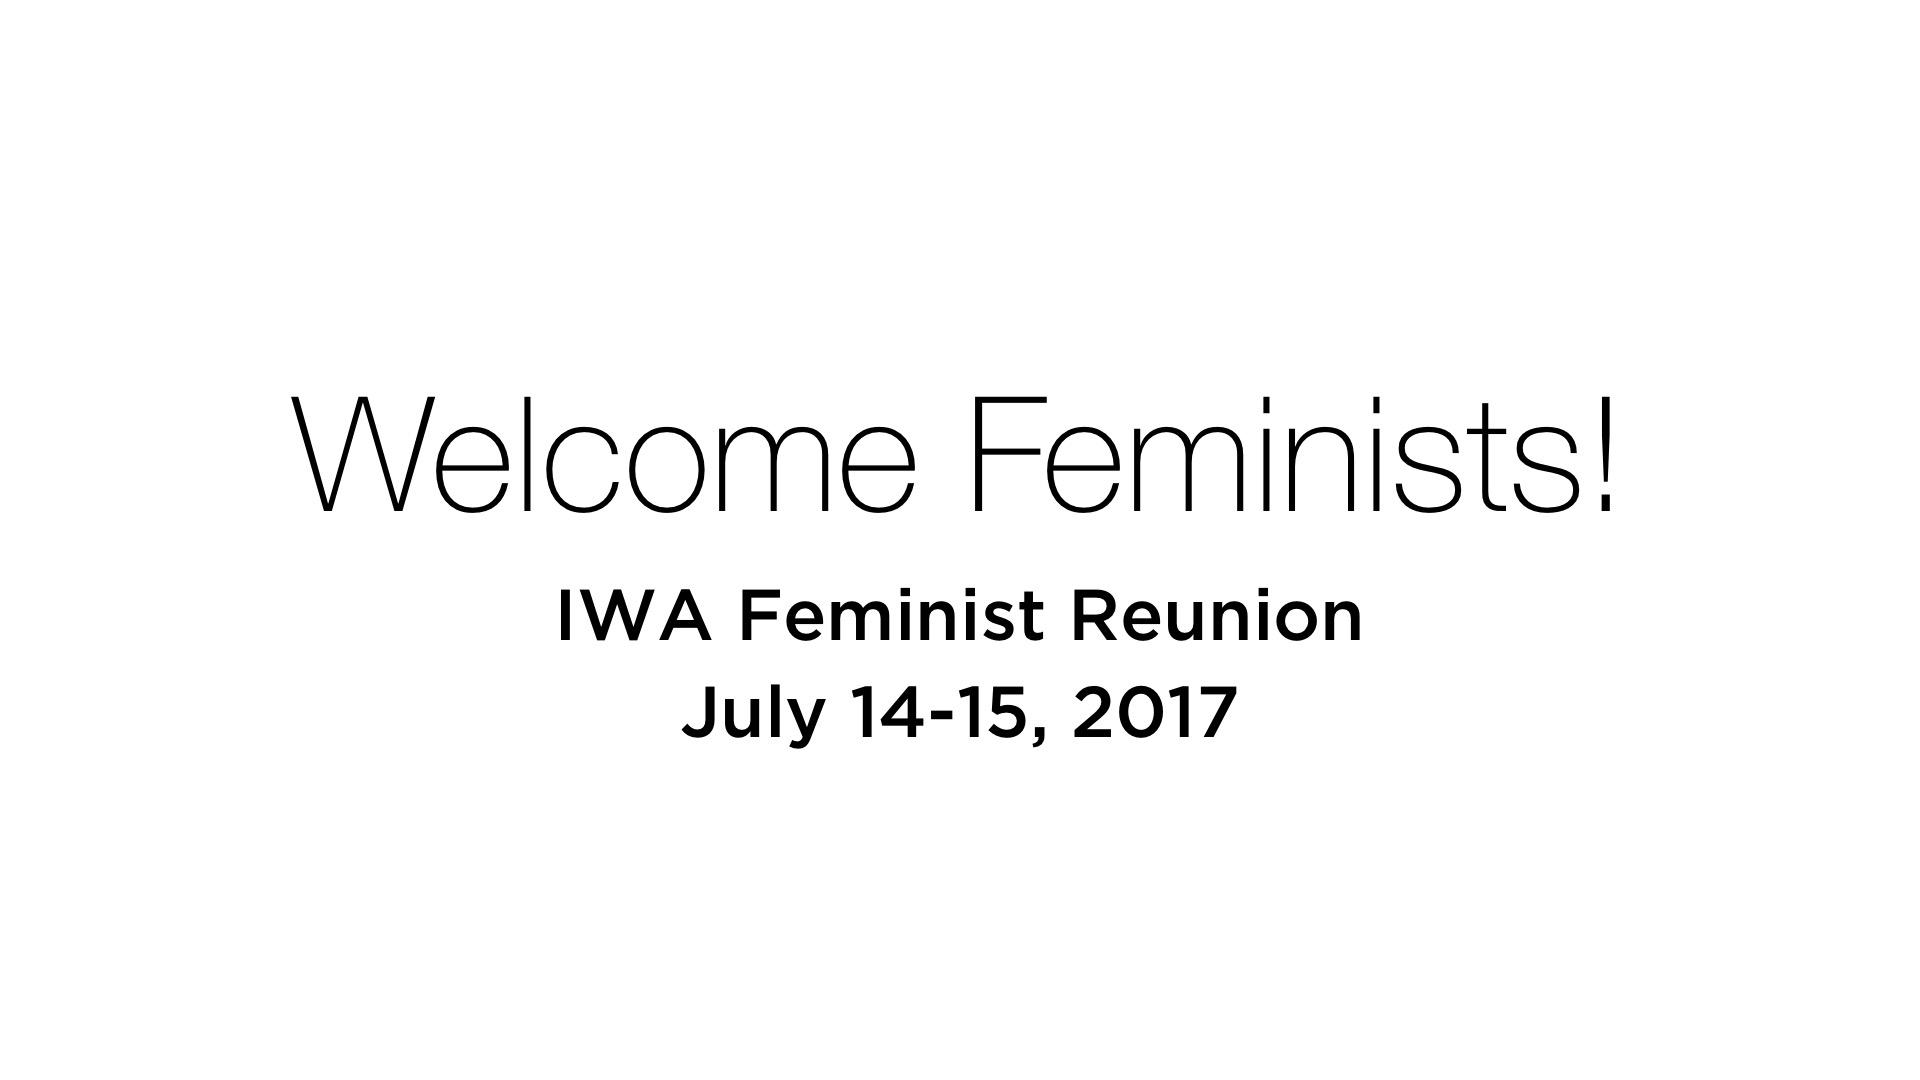 Welcome Feminists! IWA Feminist Reunion July 14-15, 2017